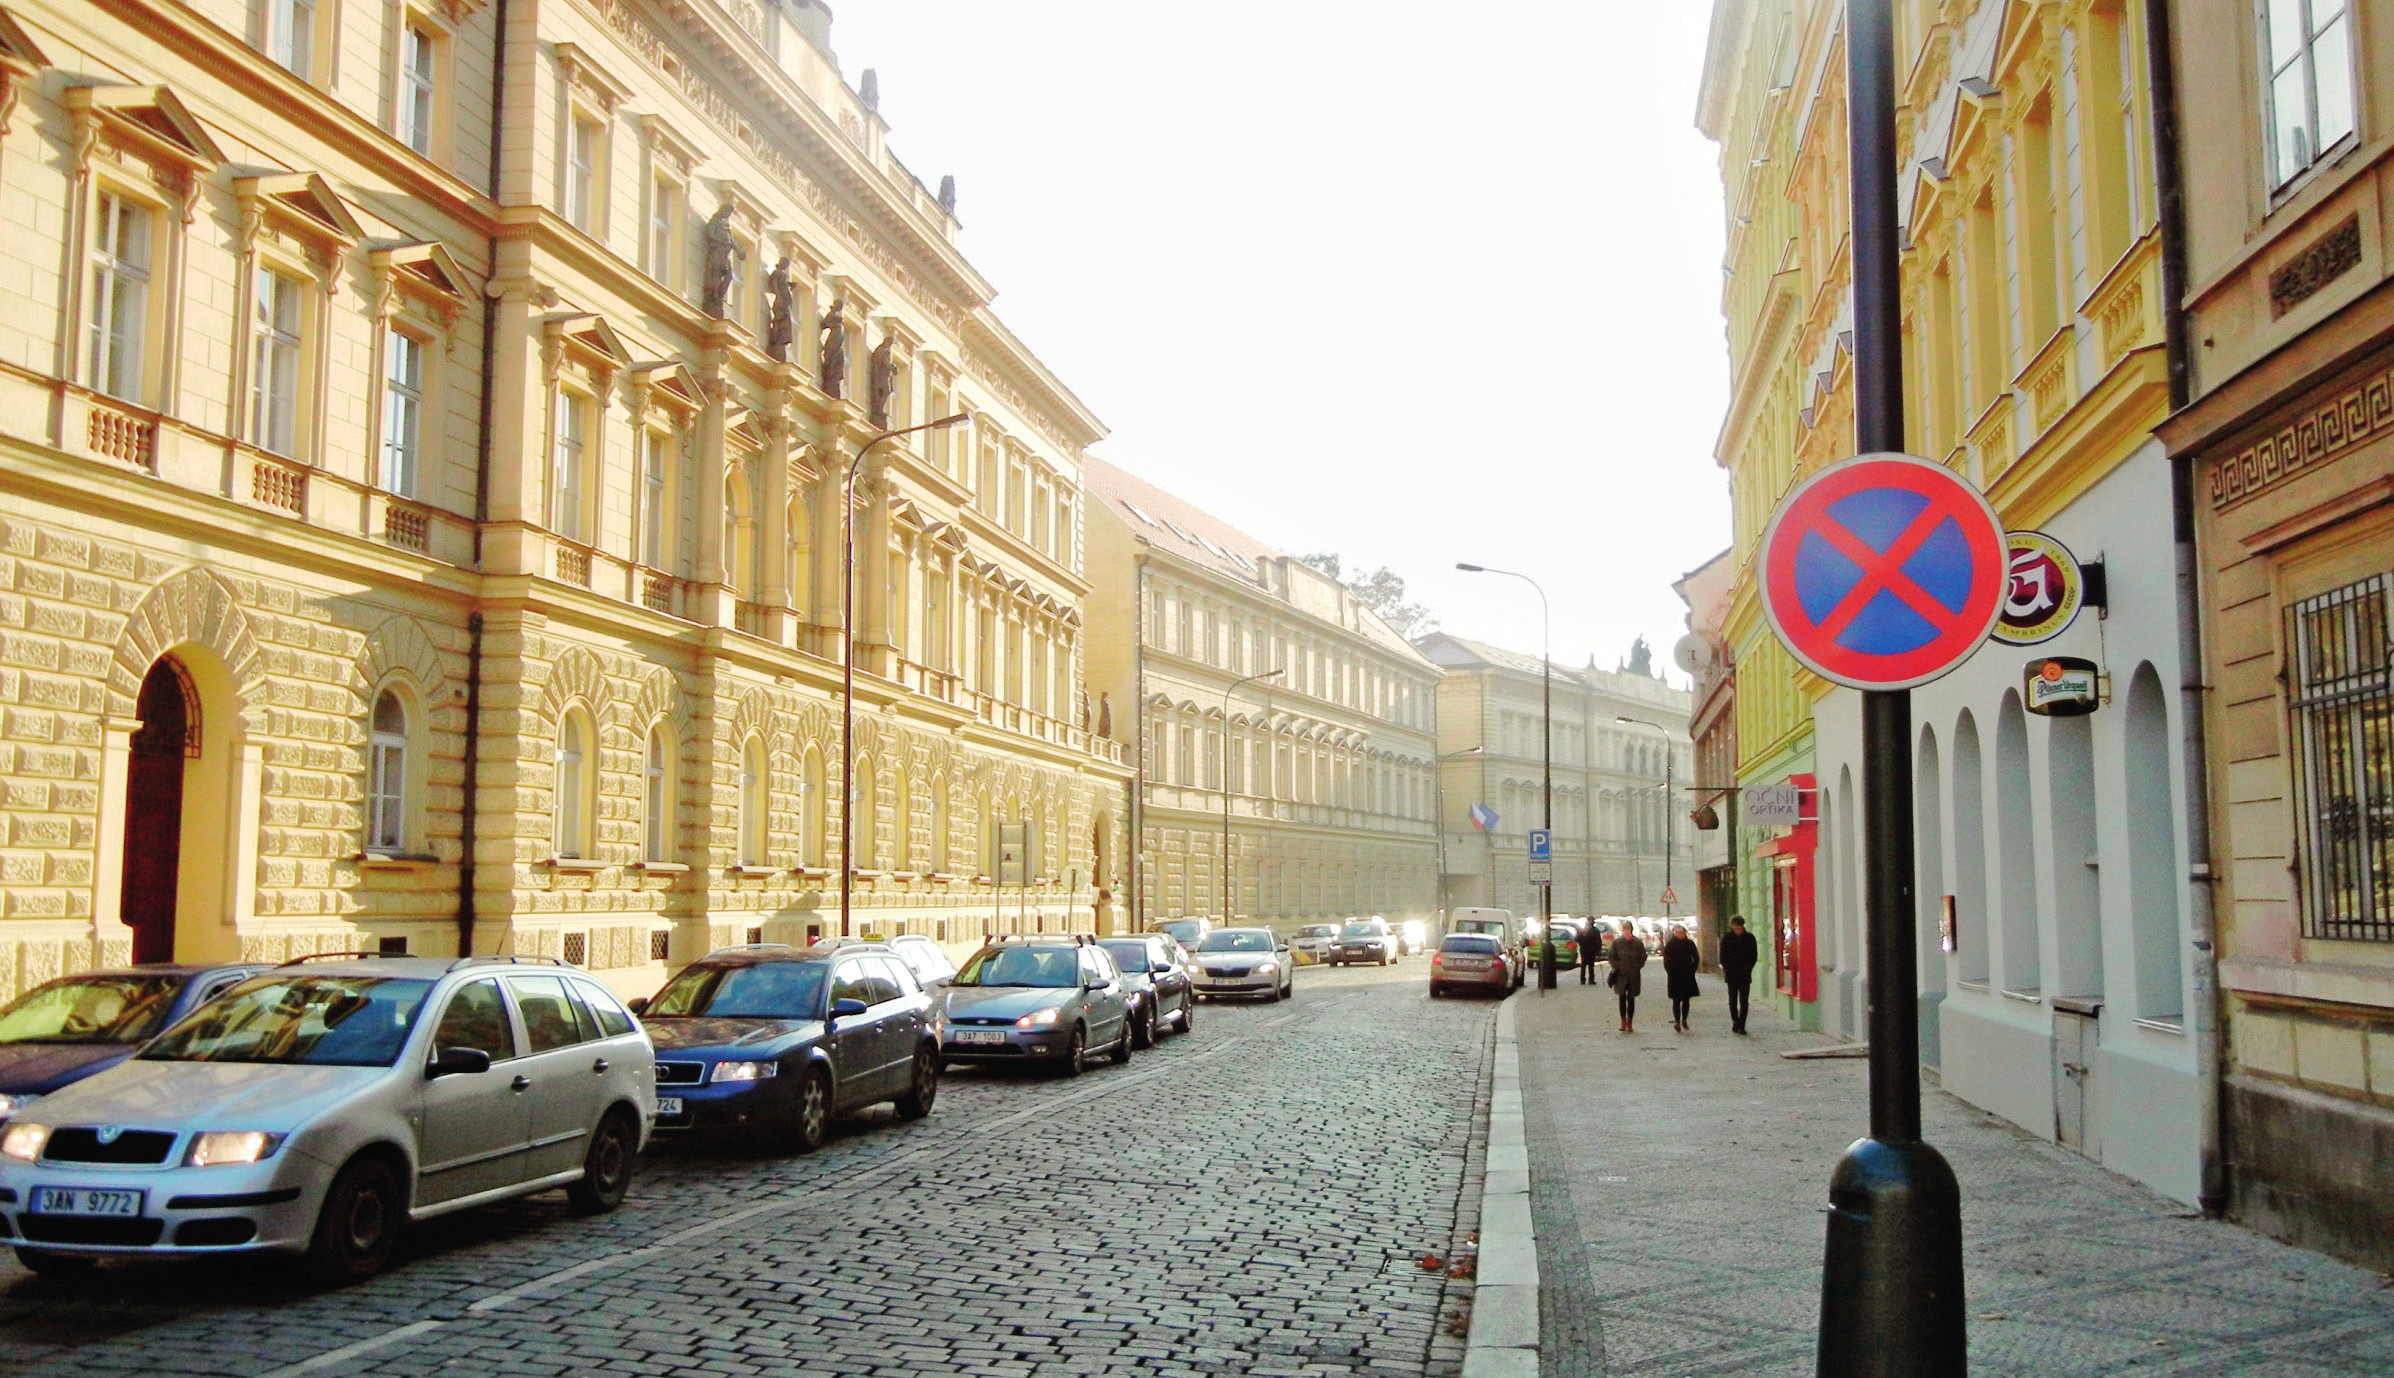 Celý komplex budov bývalého chudobince, dnes Ministerstva spravedlnosti, a Gymnázia Botičská (budova na konci)